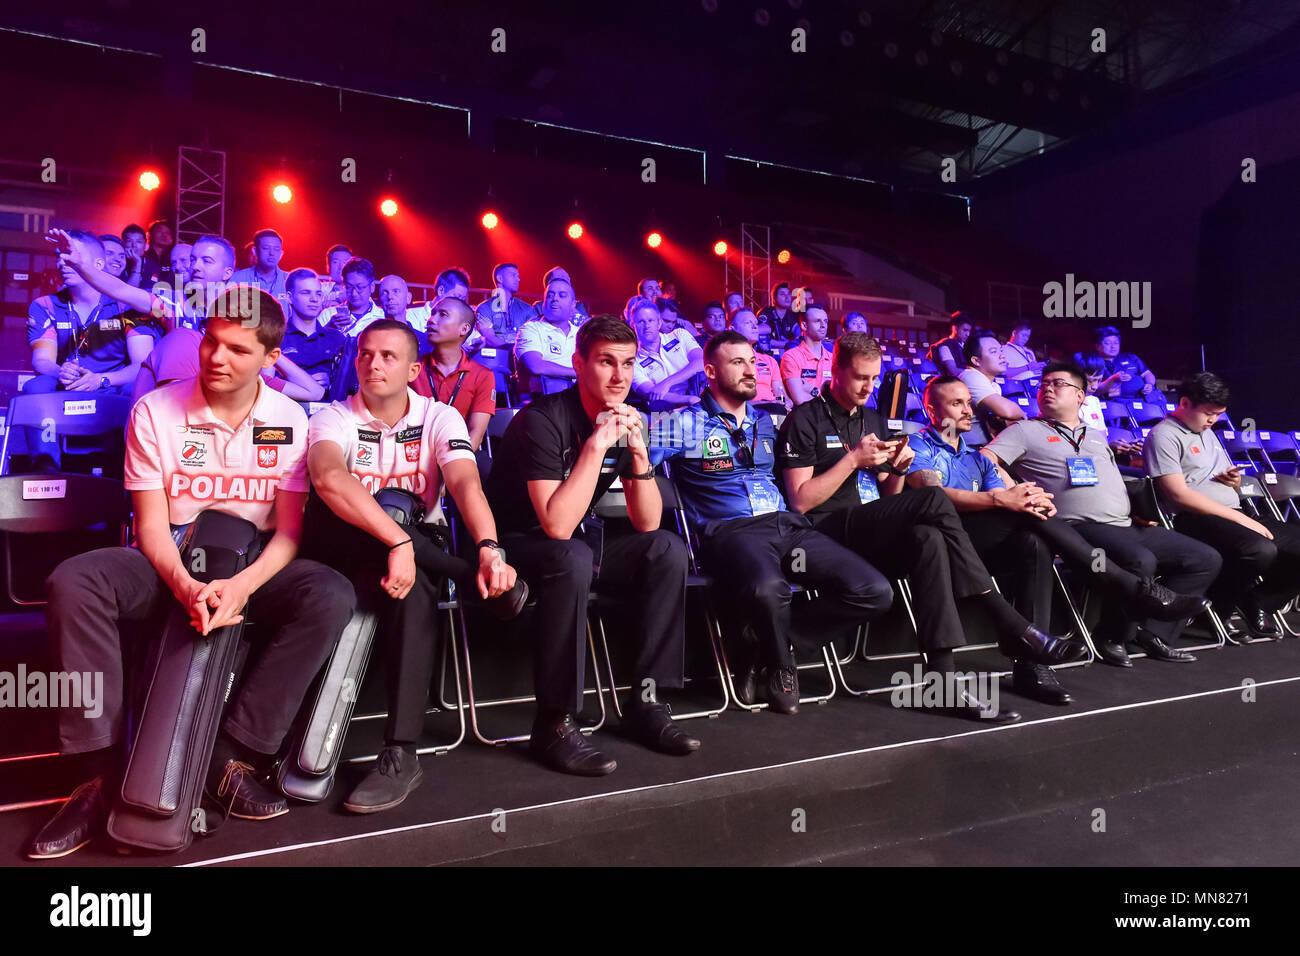 Shanghai, China. 15th May 2018. The international players during WORLD CUP of POOL 2018: OPENING CEREMONY at Luwan (Gymnasium) Arena on Tuesday, 15 May 2018. SHANGHAI, CHINA. Credit: Taka G Wu Credit: Taka Wu/Alamy Live News - Stock Image